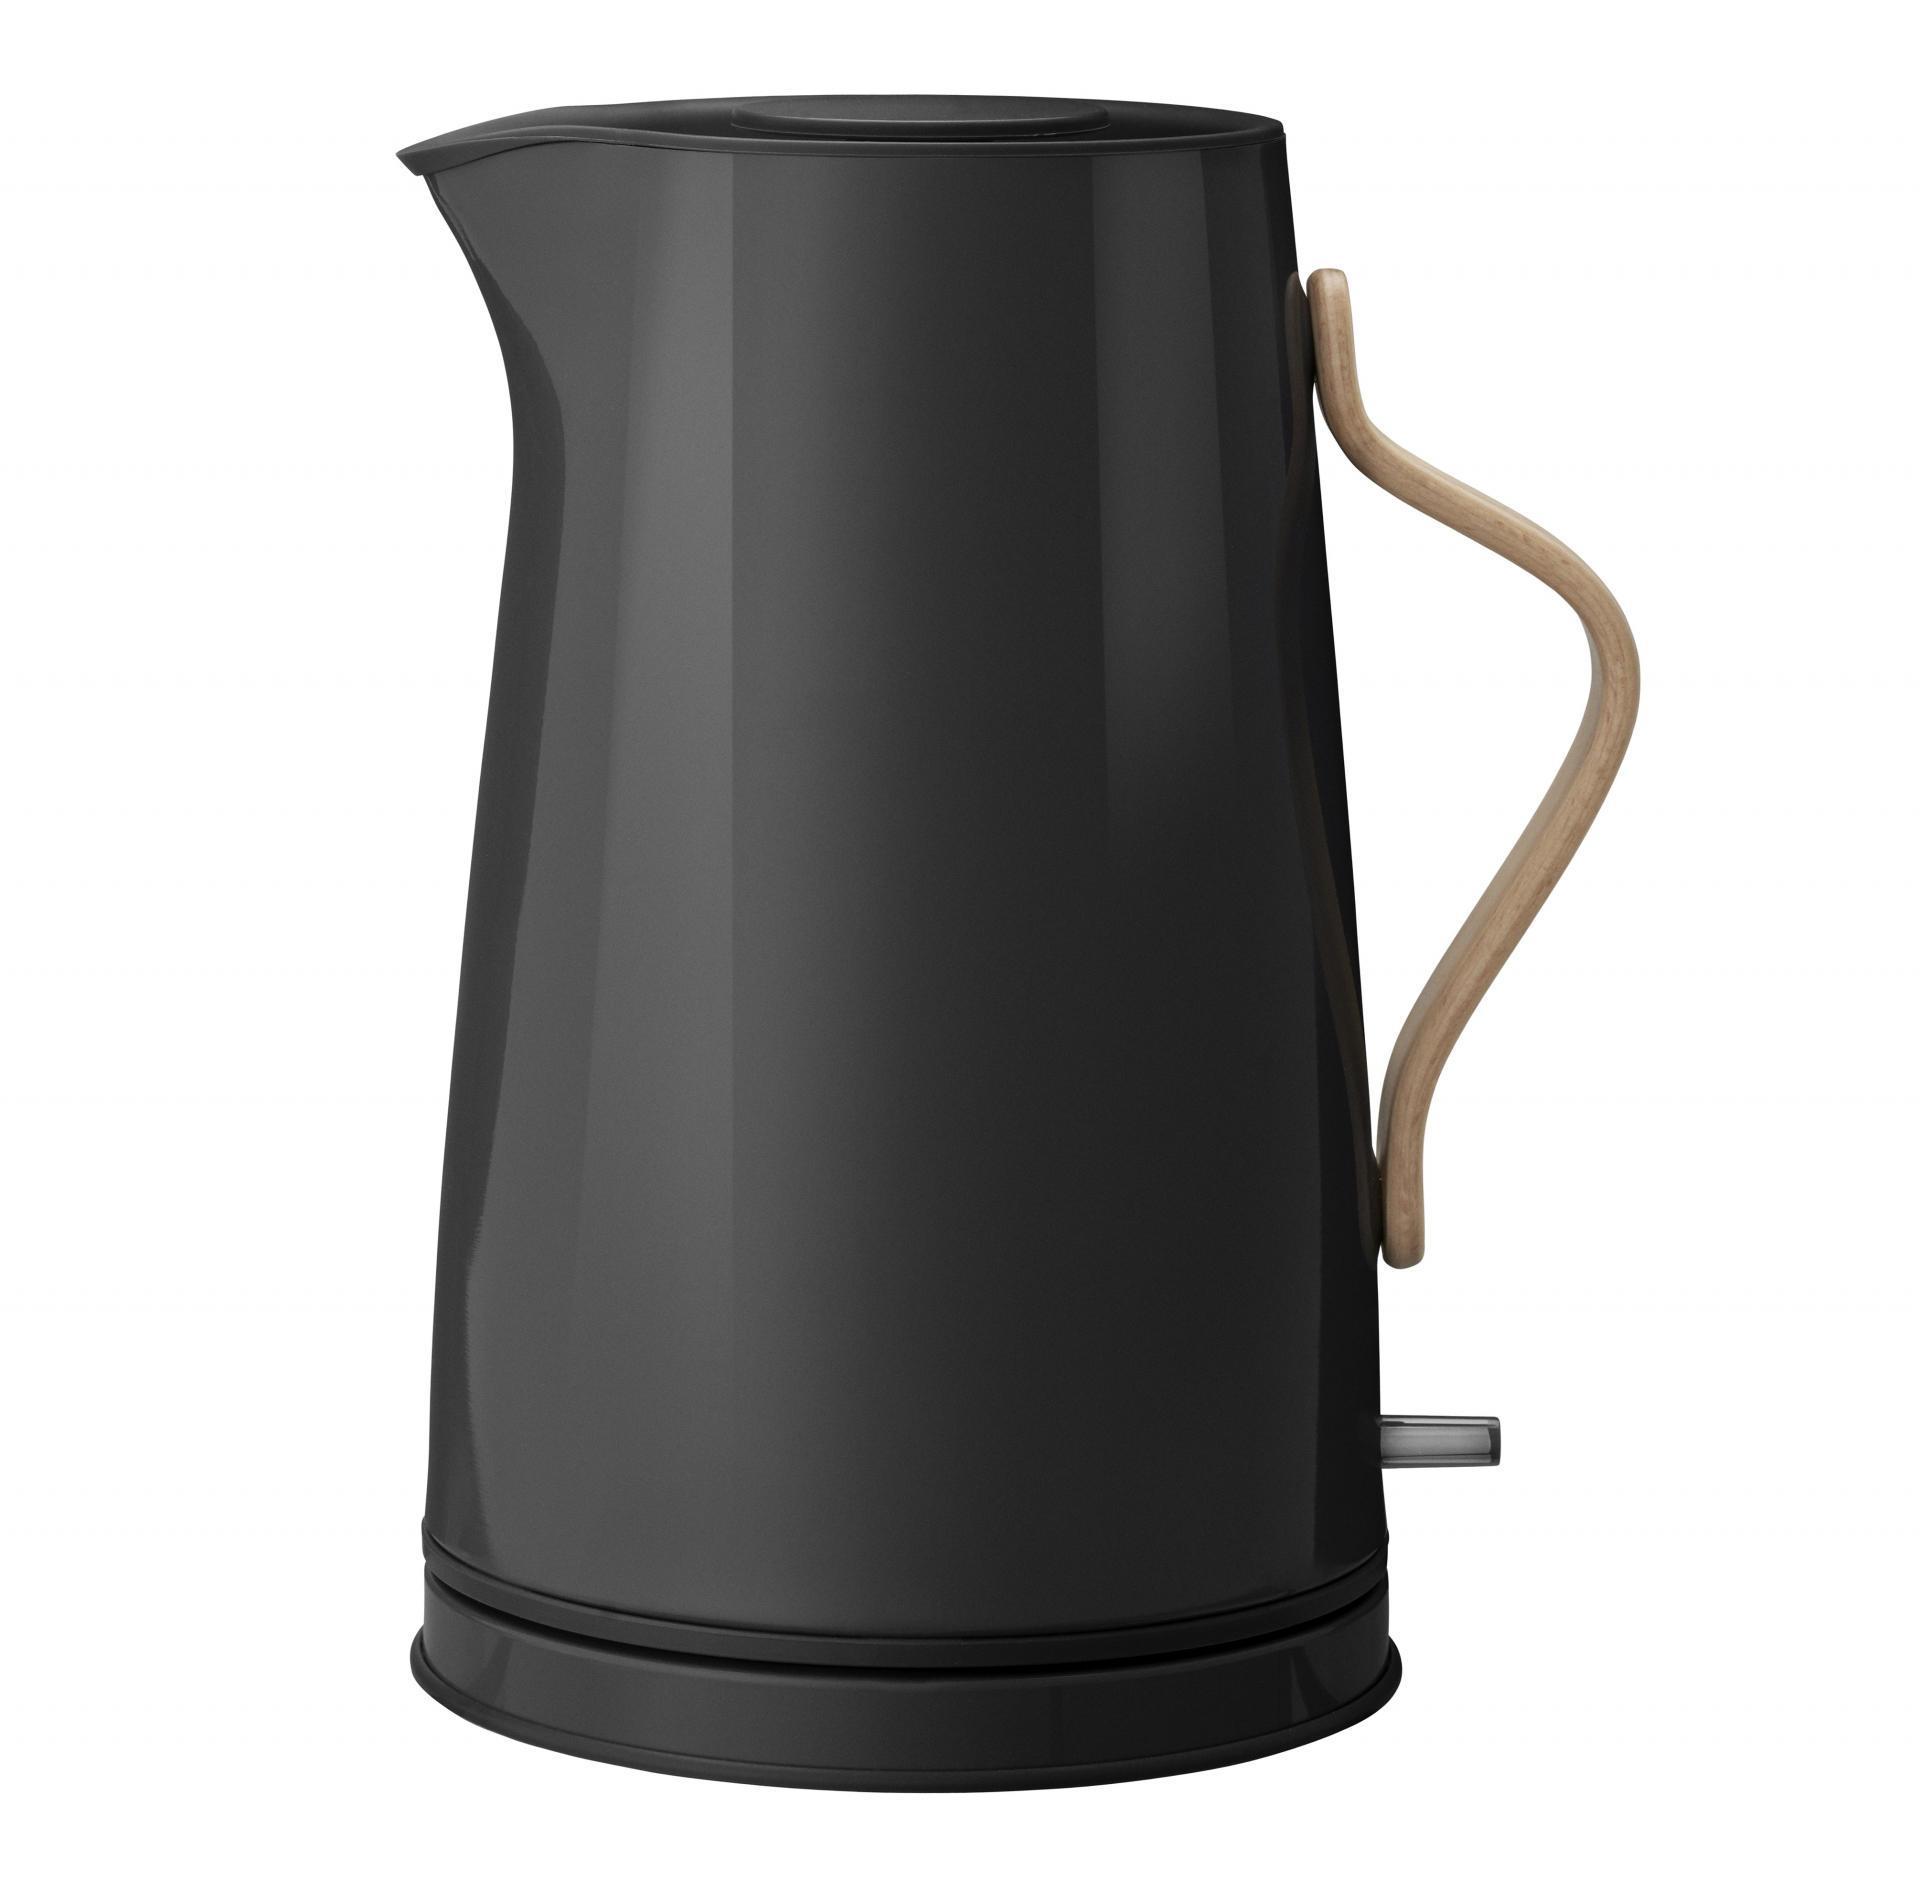 Stelton Rychlovarná konvice Emma Black, černá barva, kov